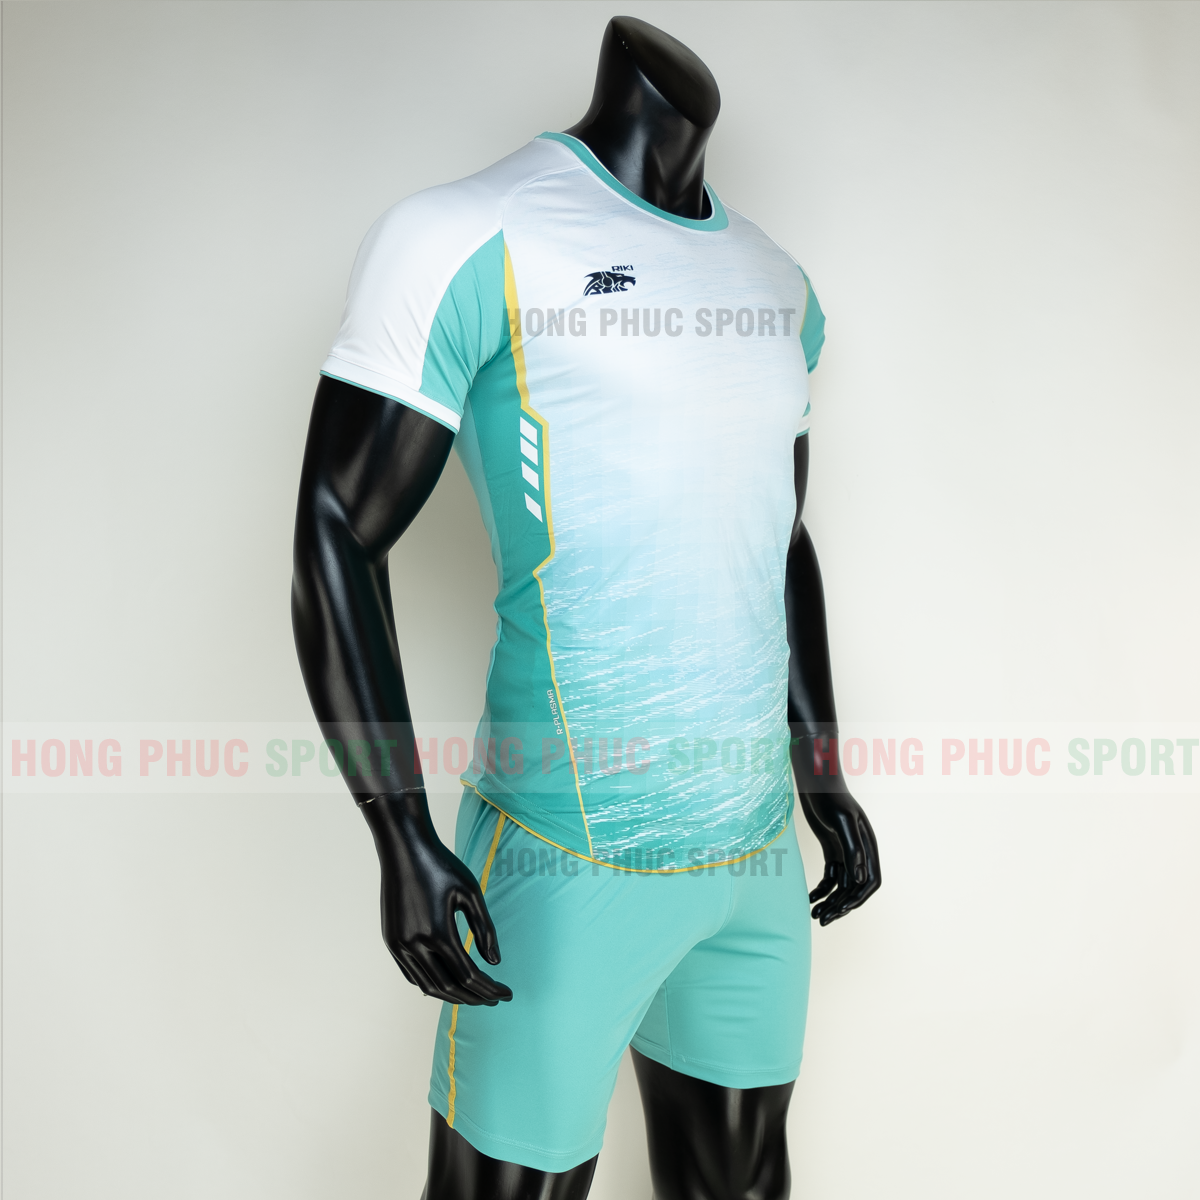 https://cdn.hongphucsport.com/unsafe/s4.shopbay.vn/files/285/ao-bong-da-khong-logo-riki-grambor-mau-xanh-ngoc-4-605061cc698b6.png